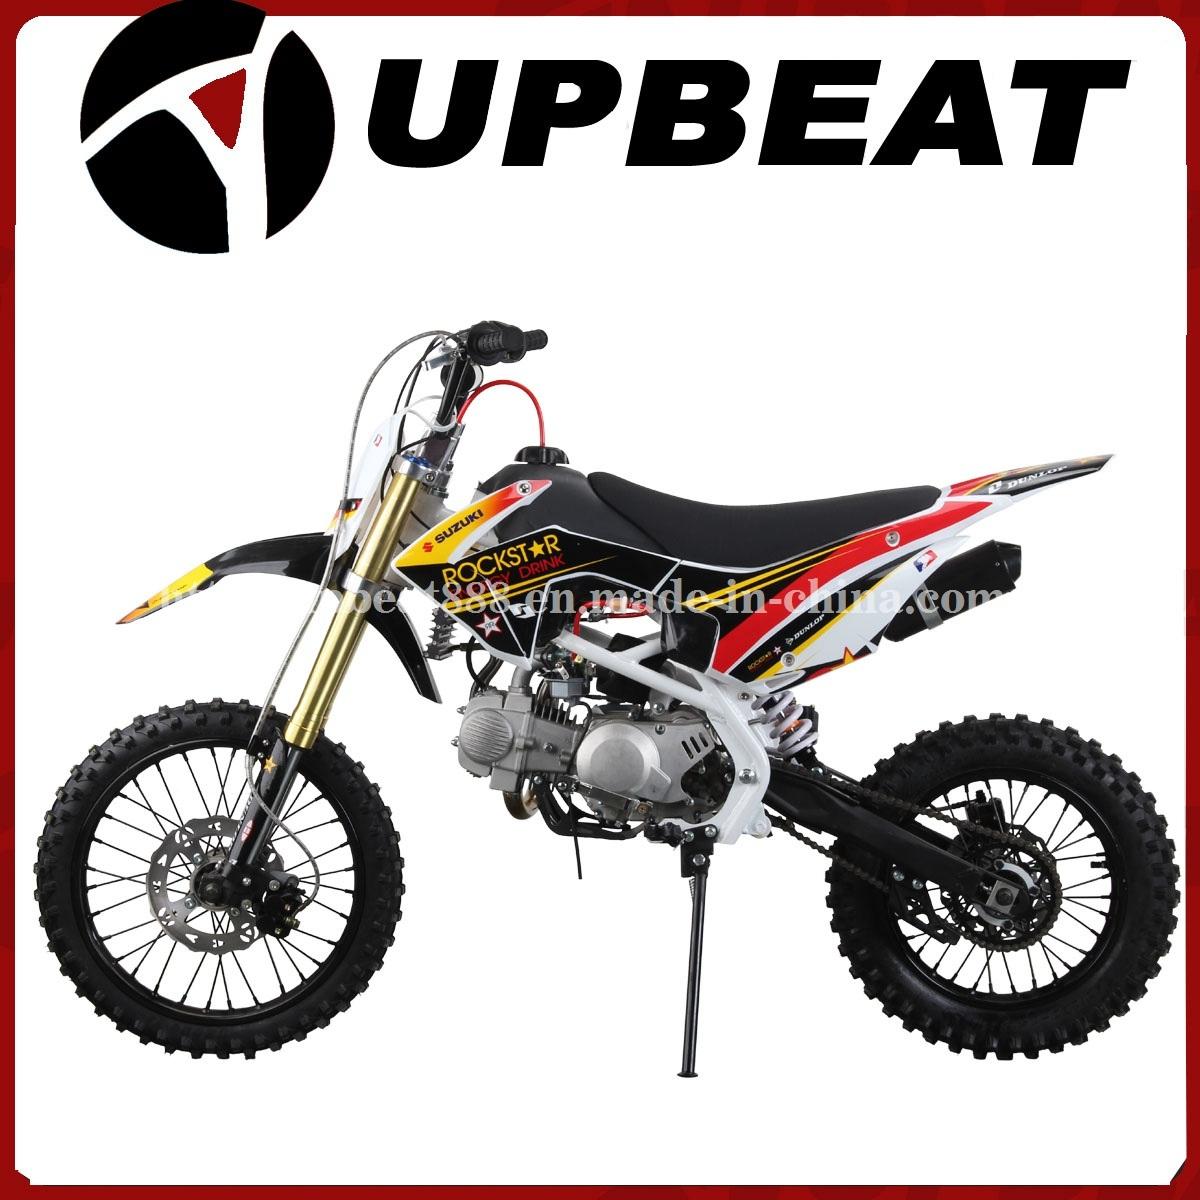 Upbeat 140cc Pit Bike 150cc Pit Bike Crf110 New Model